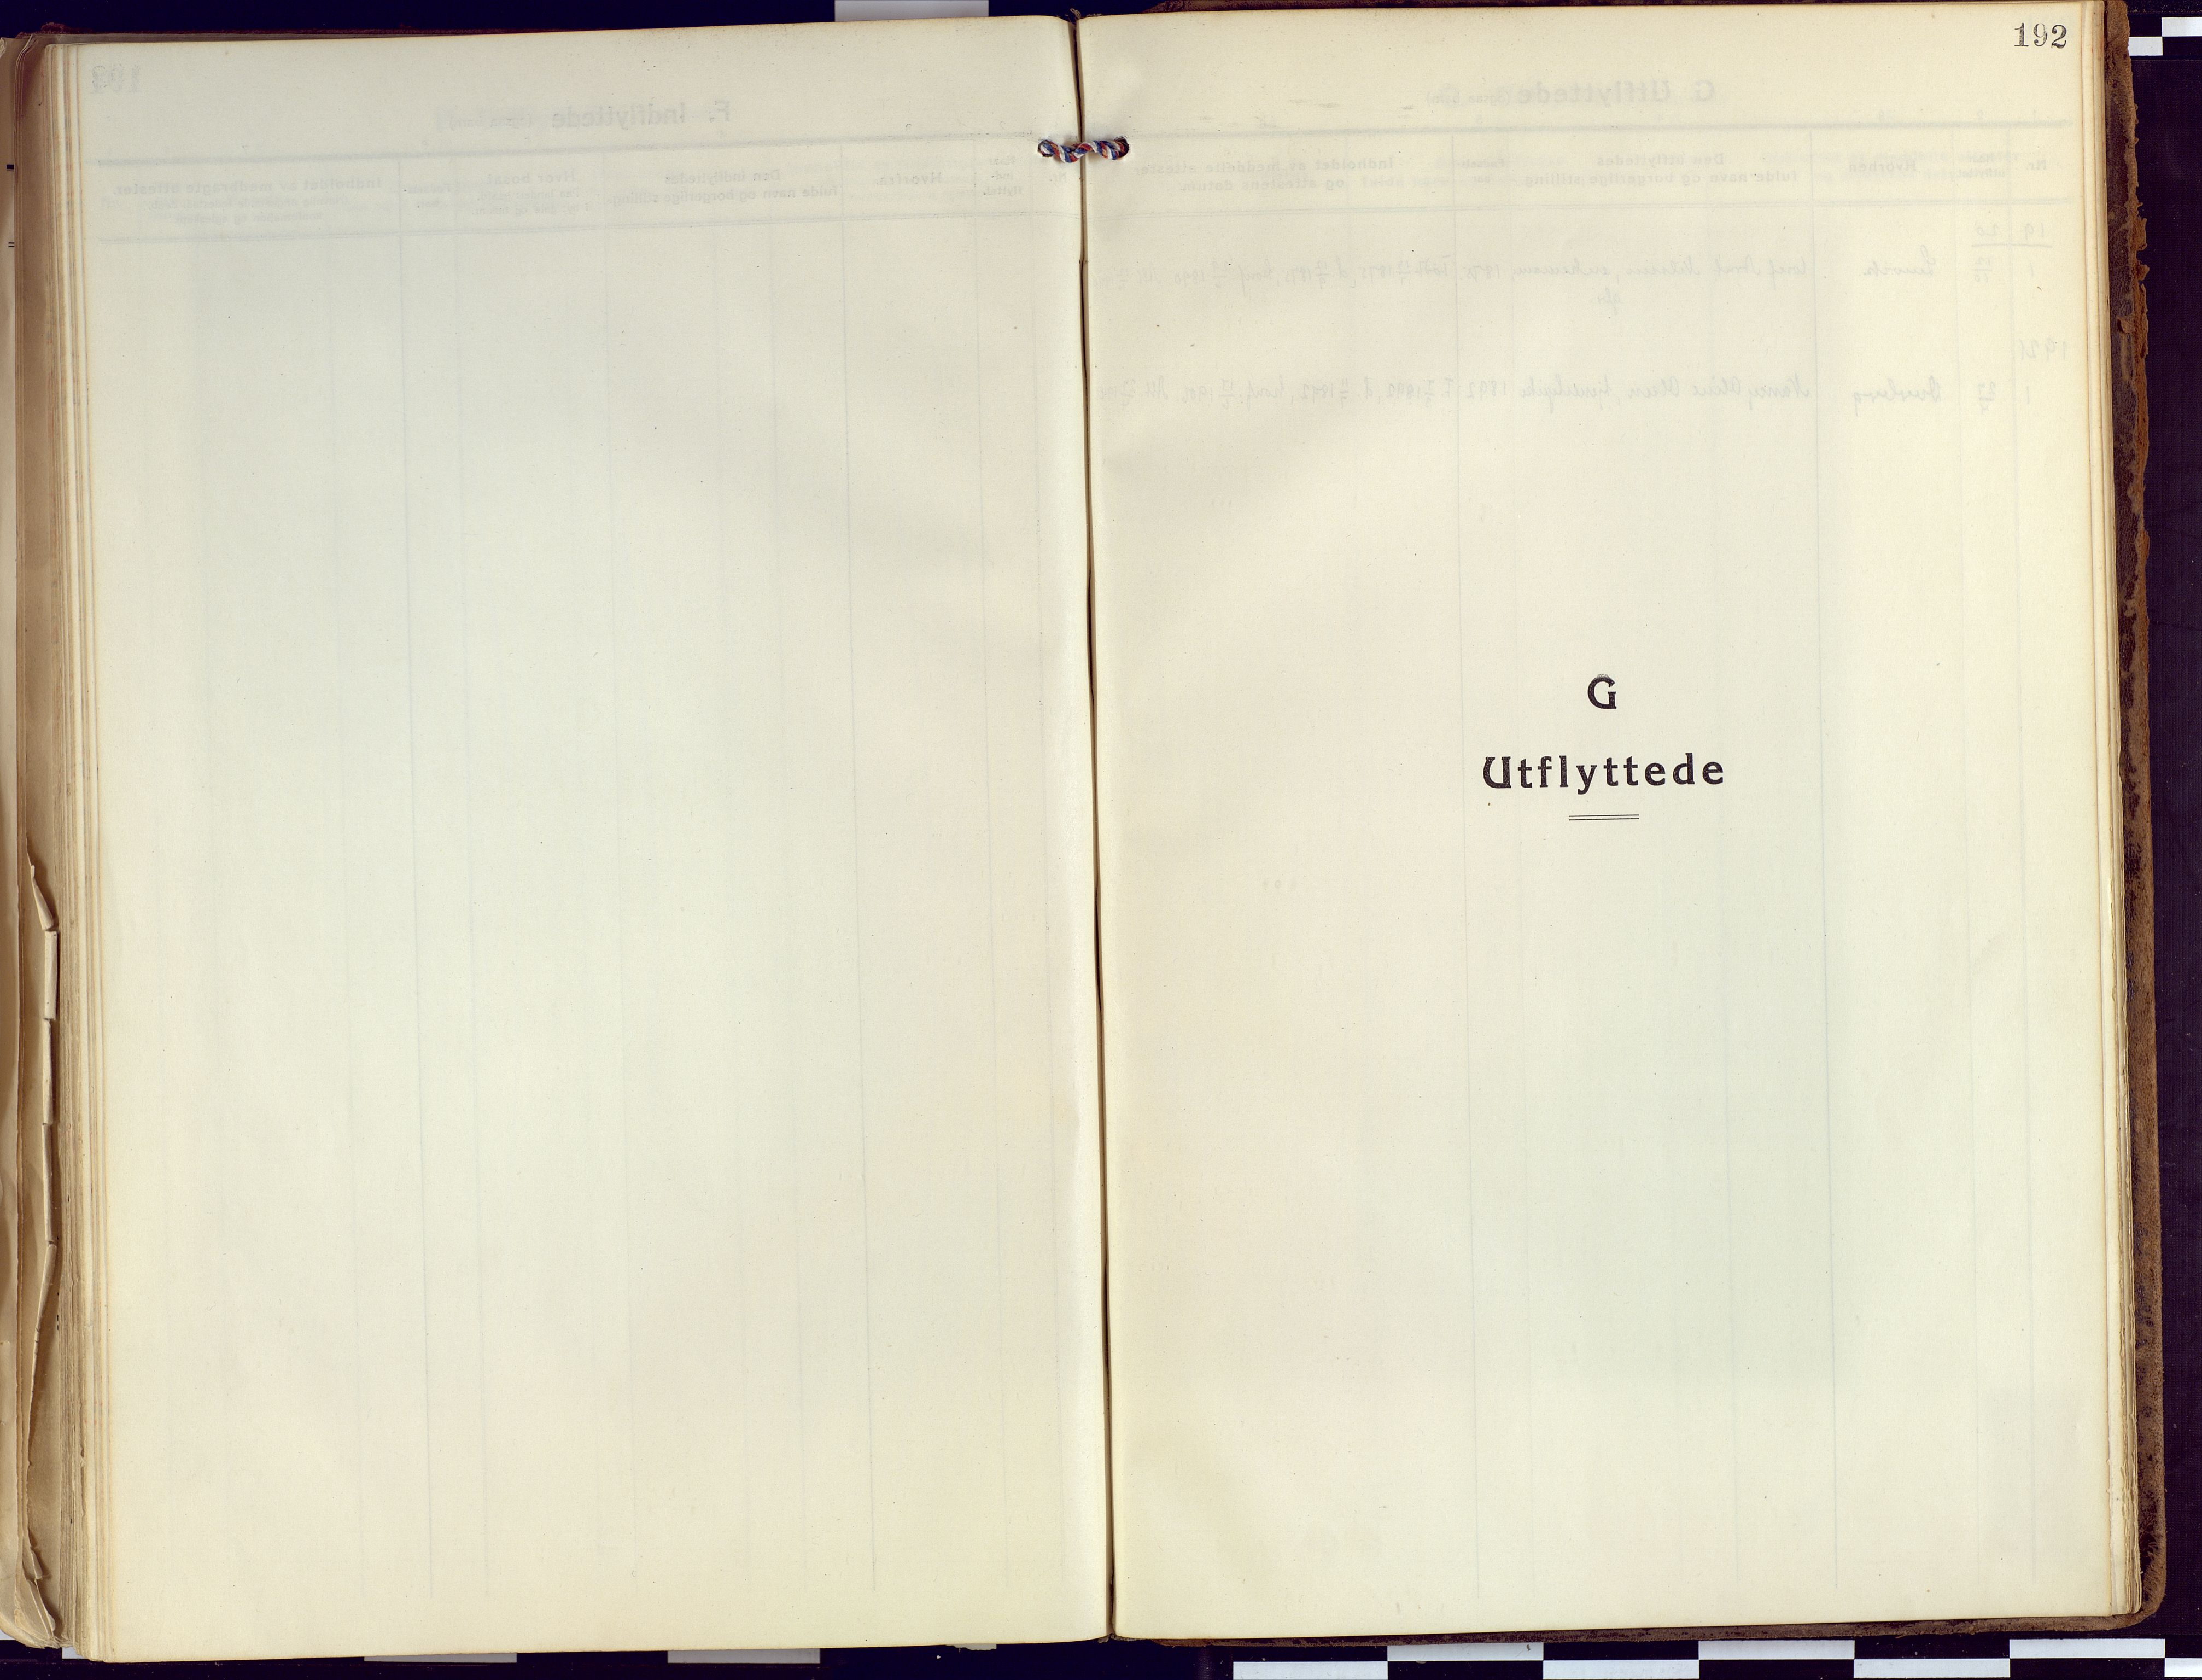 SATØ, Tranøy sokneprestkontor, I/Ia/Iaa/L0015kirke: Ministerialbok nr. 15, 1919-1928, s. 192